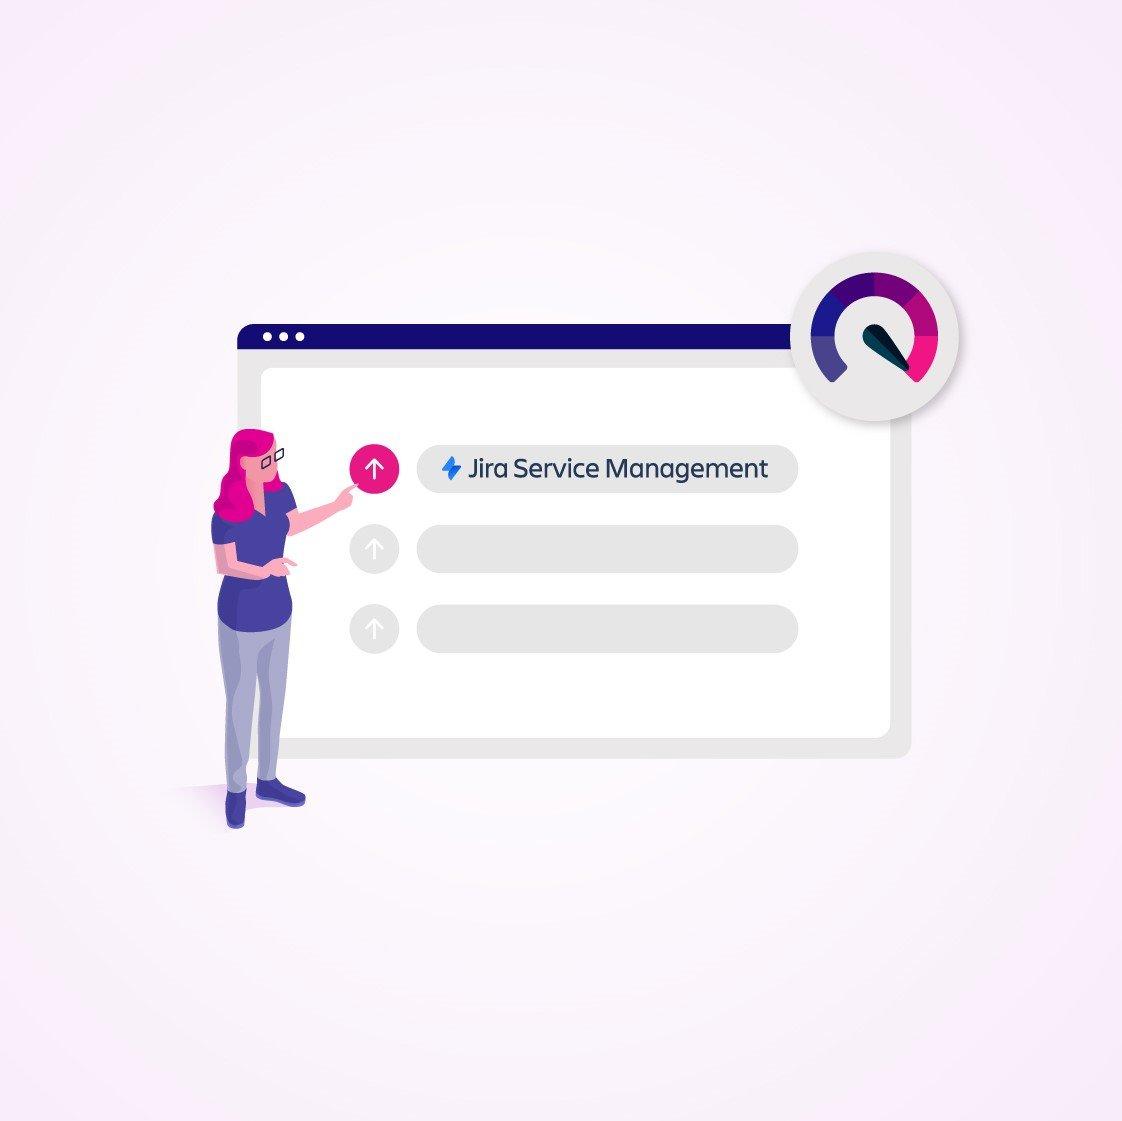 contacto Atlassian, una solución ITSM visionaria según Gartner 2021_DEISER